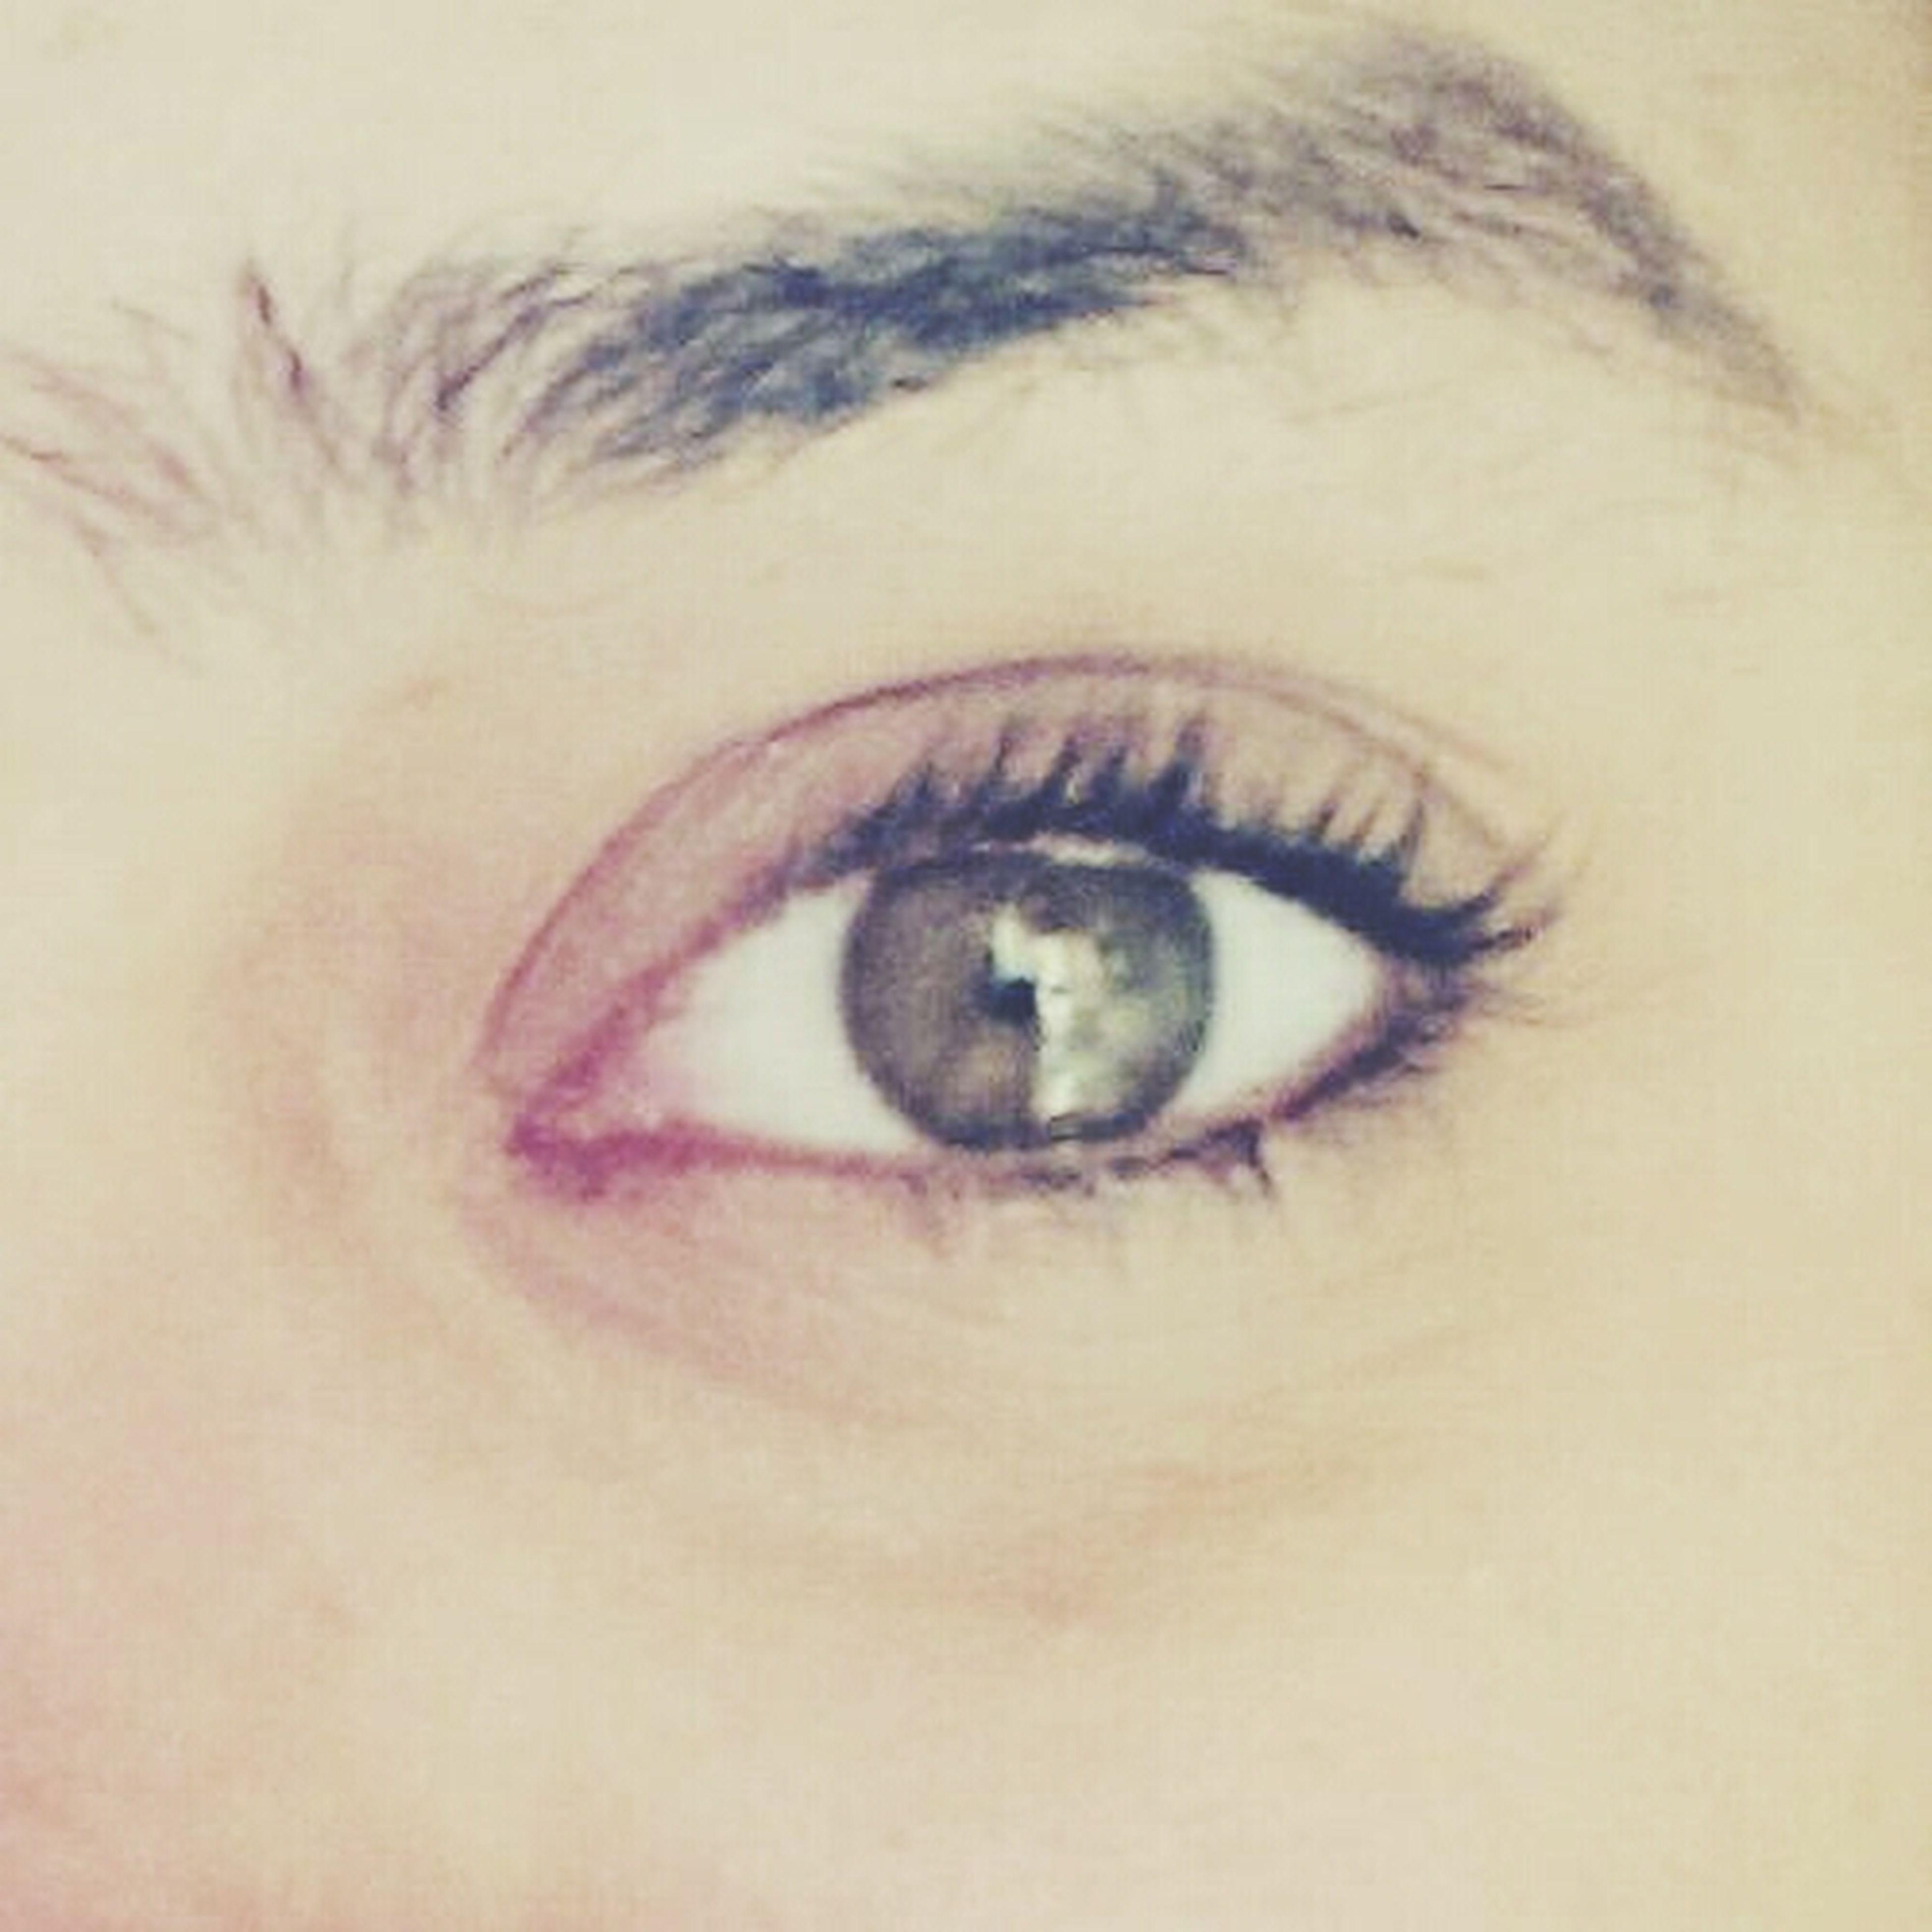 human eye, eyelash, close-up, eyesight, looking at camera, portrait, sensory perception, human face, human skin, eyeball, part of, iris - eye, extreme close-up, eyebrow, lifestyles, headshot, extreme close up